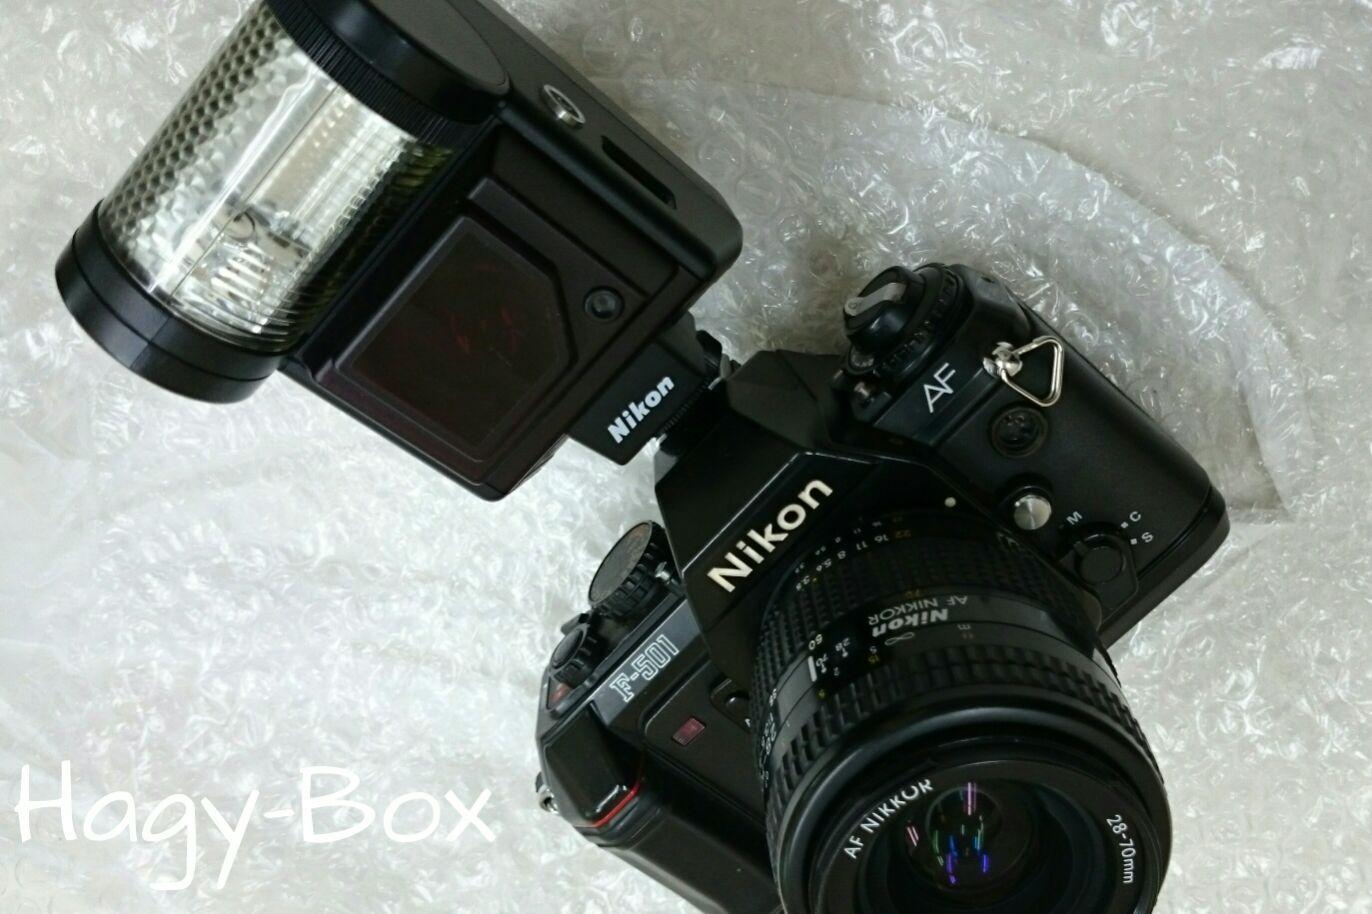 Nikon F-501AF 様をお迎えしました。その2 / Nikon F-501AF